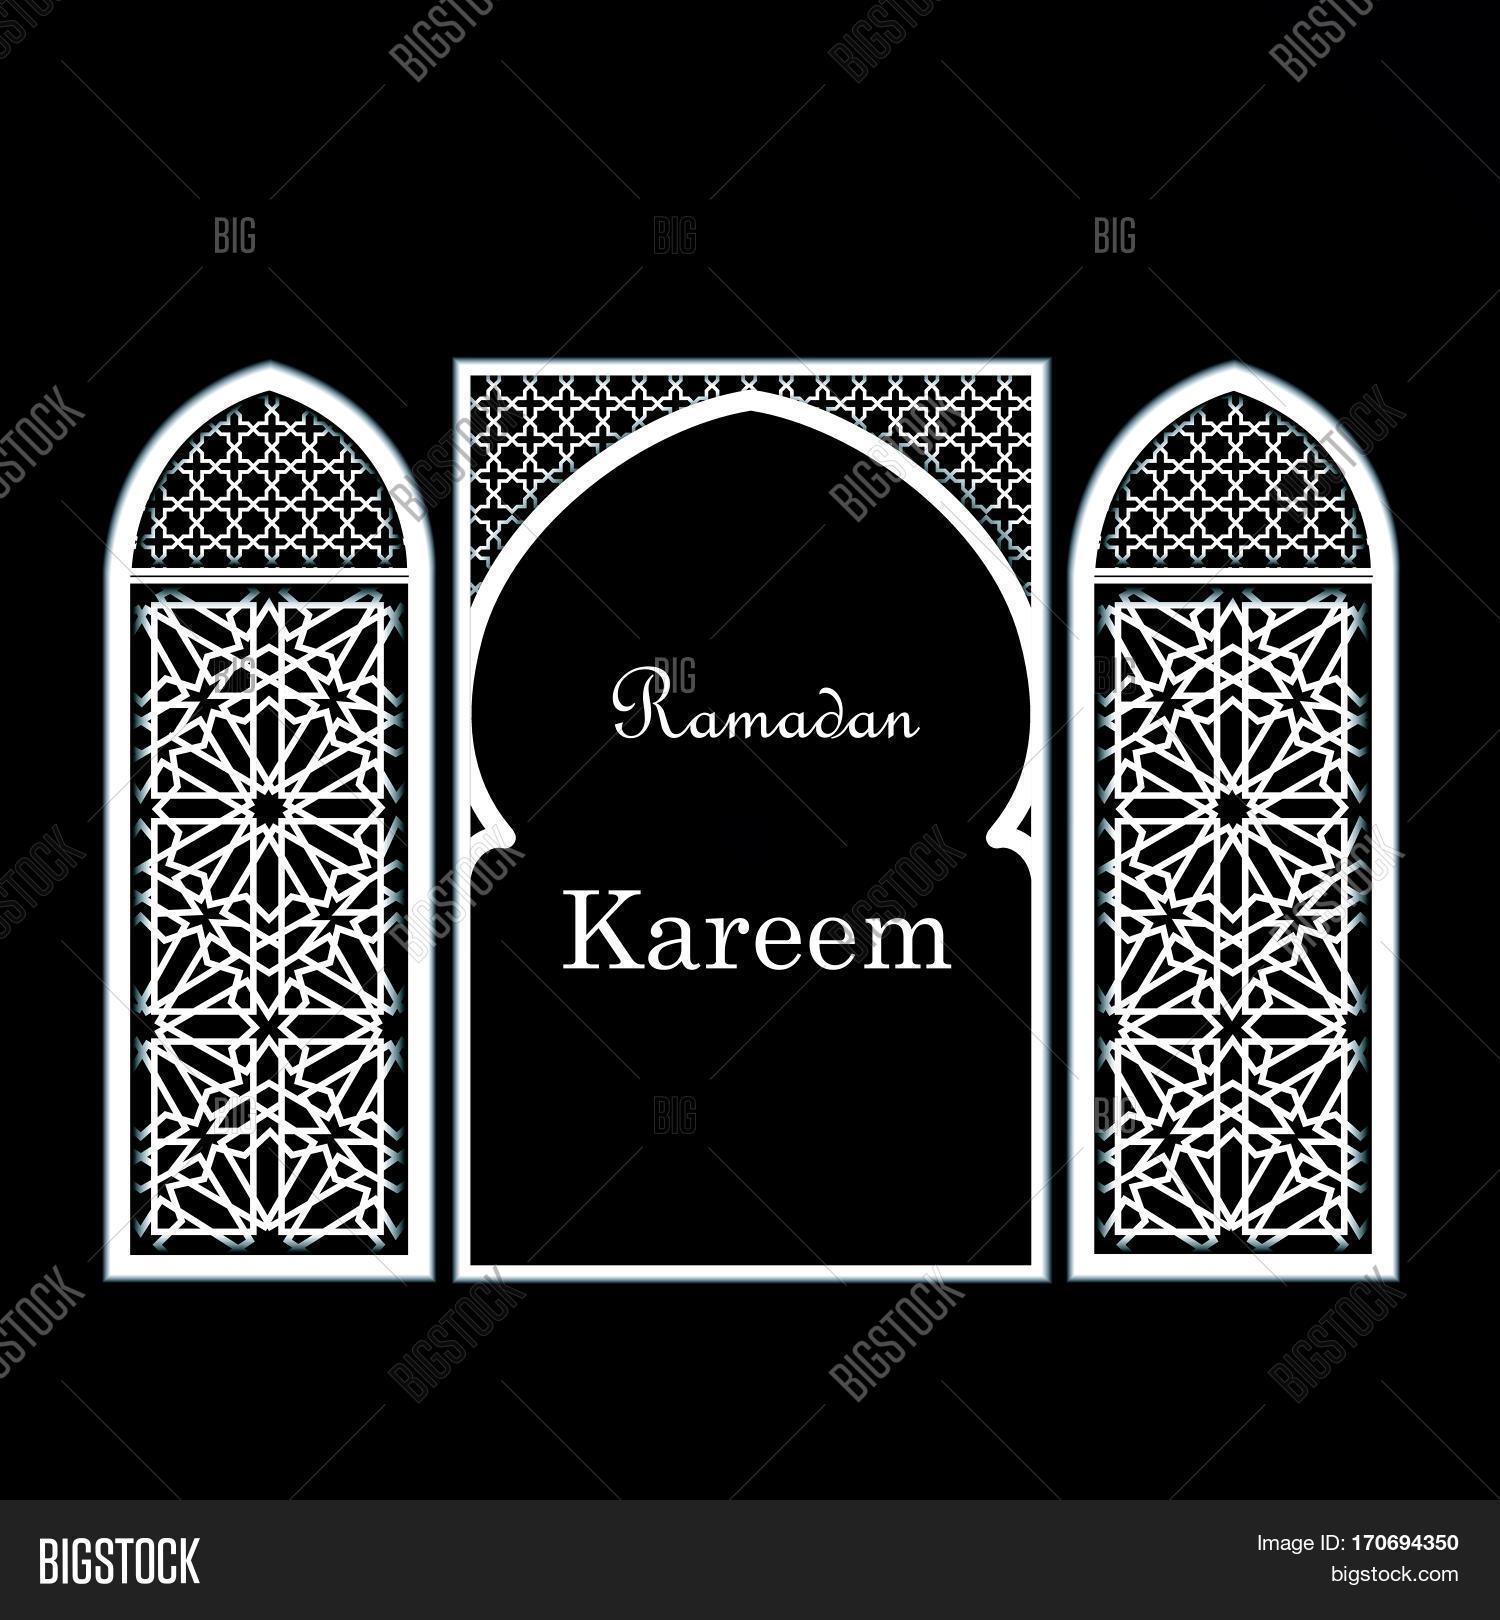 Ramadan greeting card mosque door vector photo bigstock ramadan greeting card with mosque door with arabic pattern ornament ramadan kareem calligraphy vector kristyandbryce Image collections